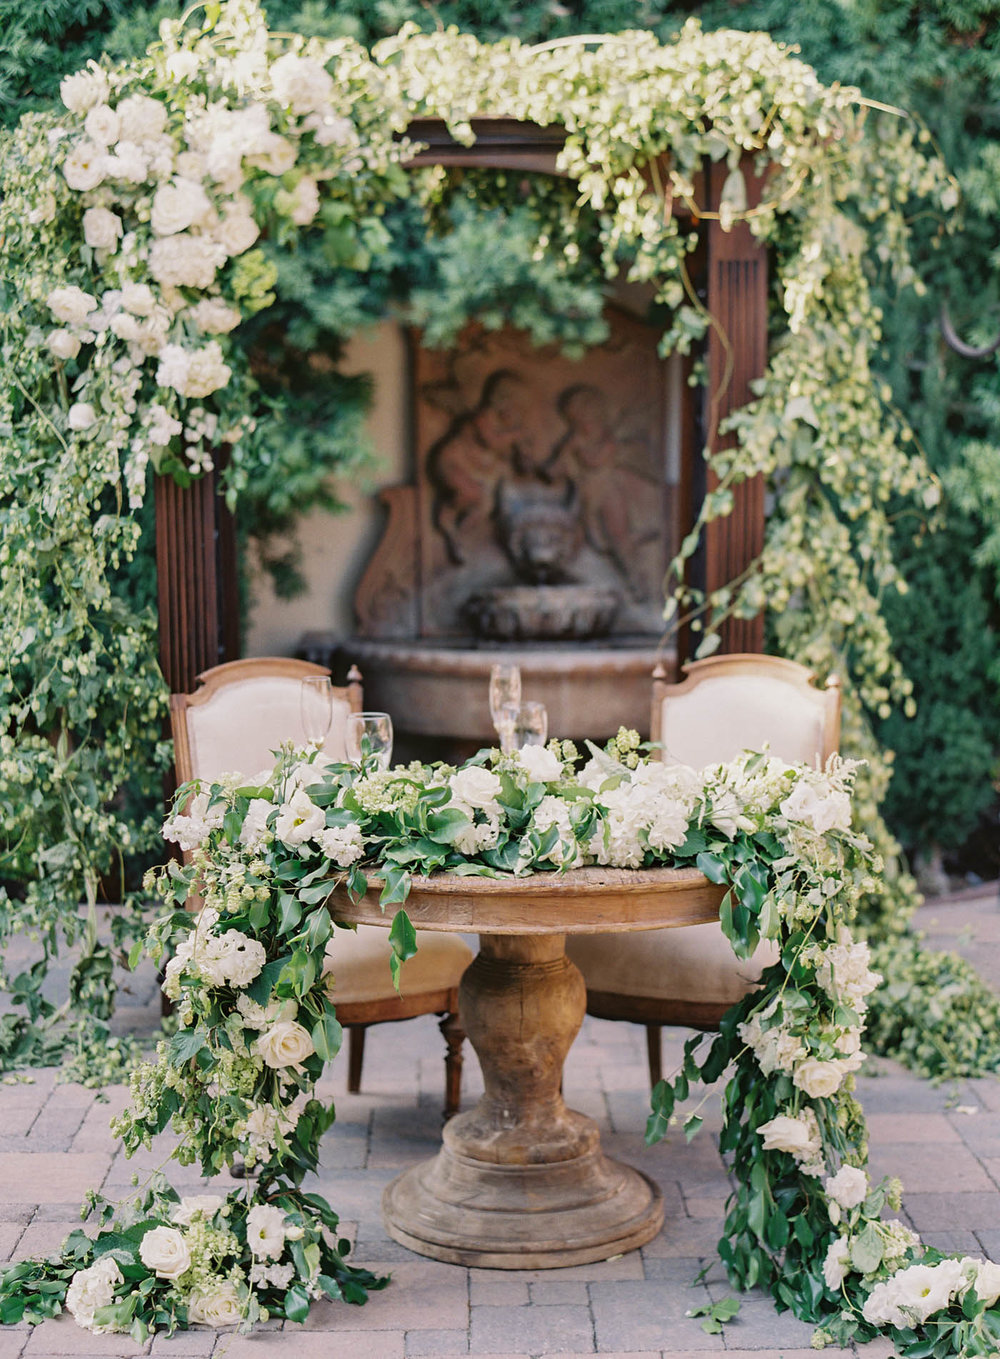 franciscan-gardens-wedding-20-Jen_Huang-000754-R1-003.jpg